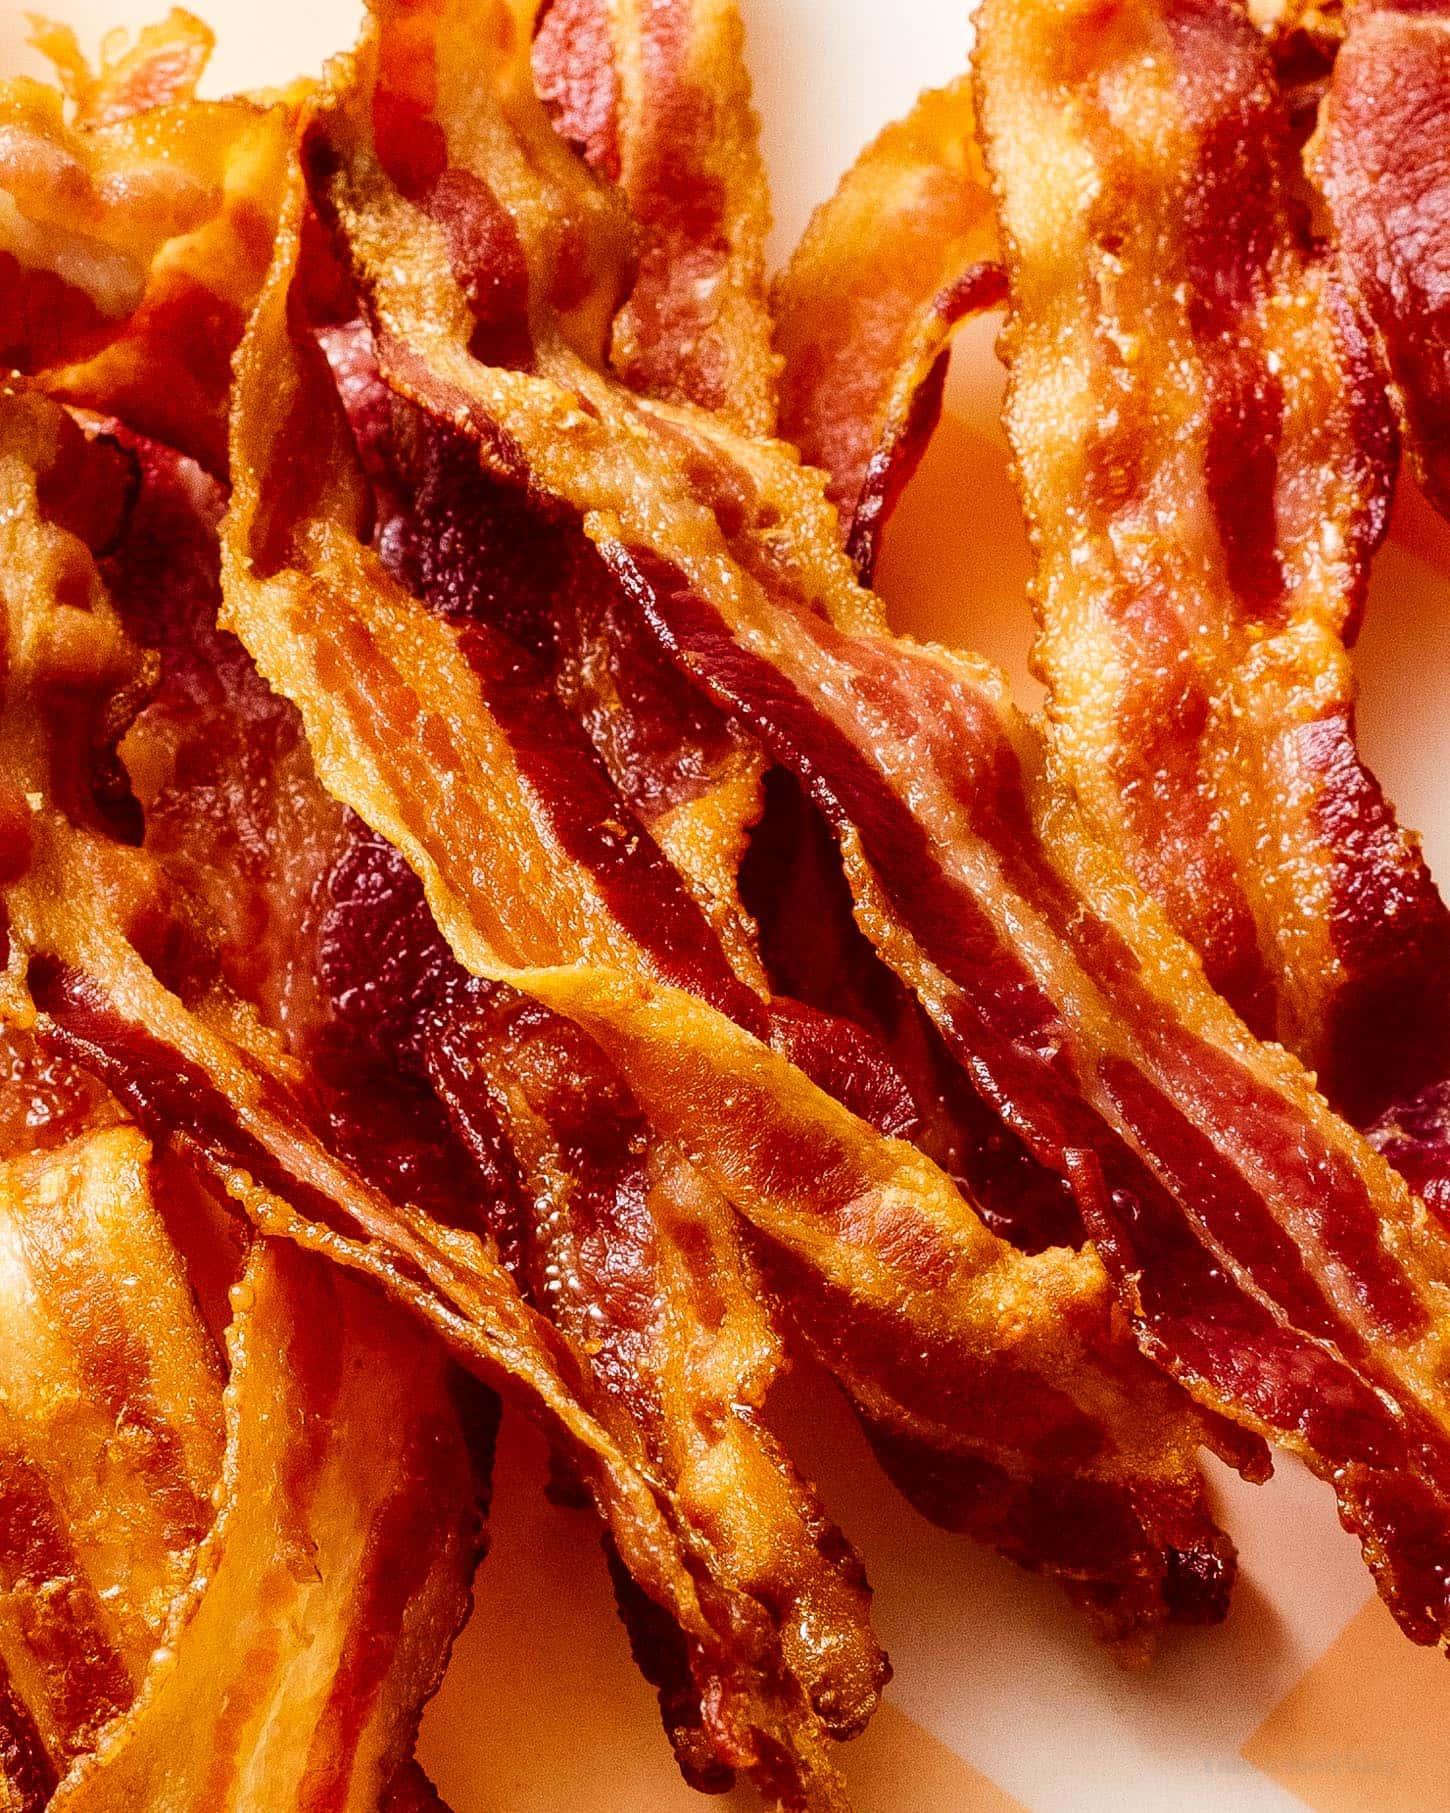 Crispy bacon |  www.iamafoodblog.com